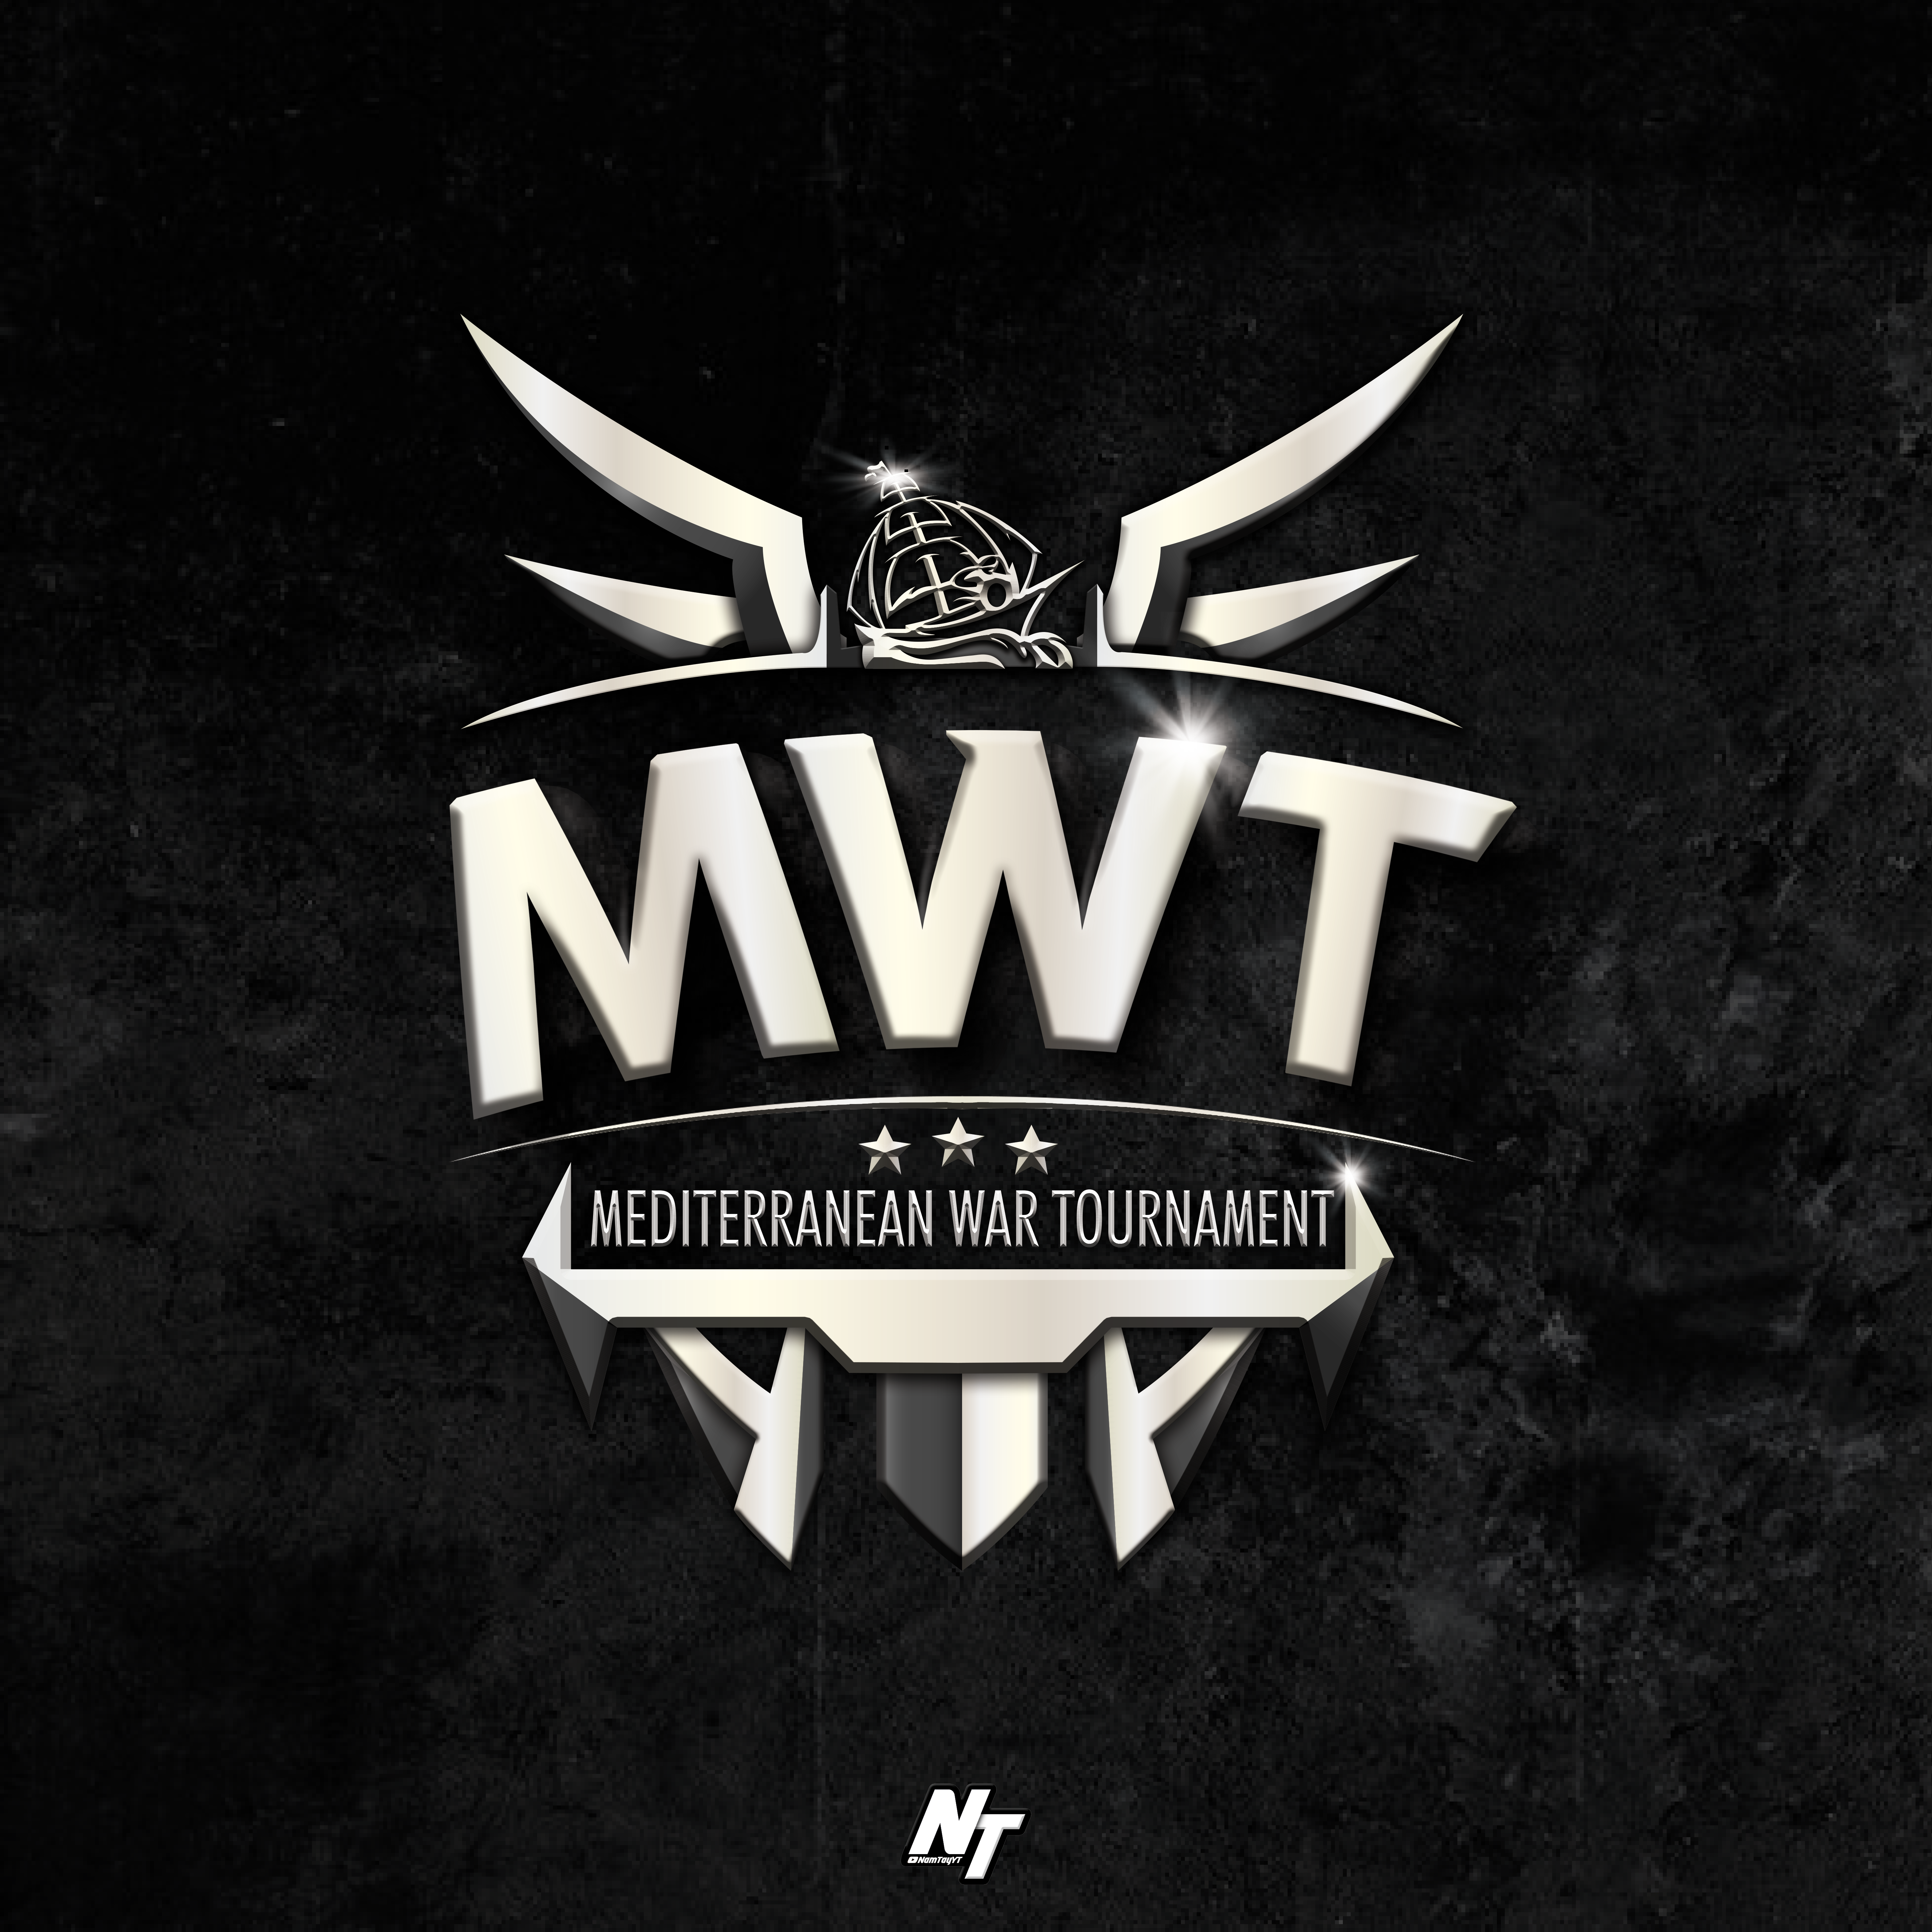 MWT - Mediterranean War Tournament